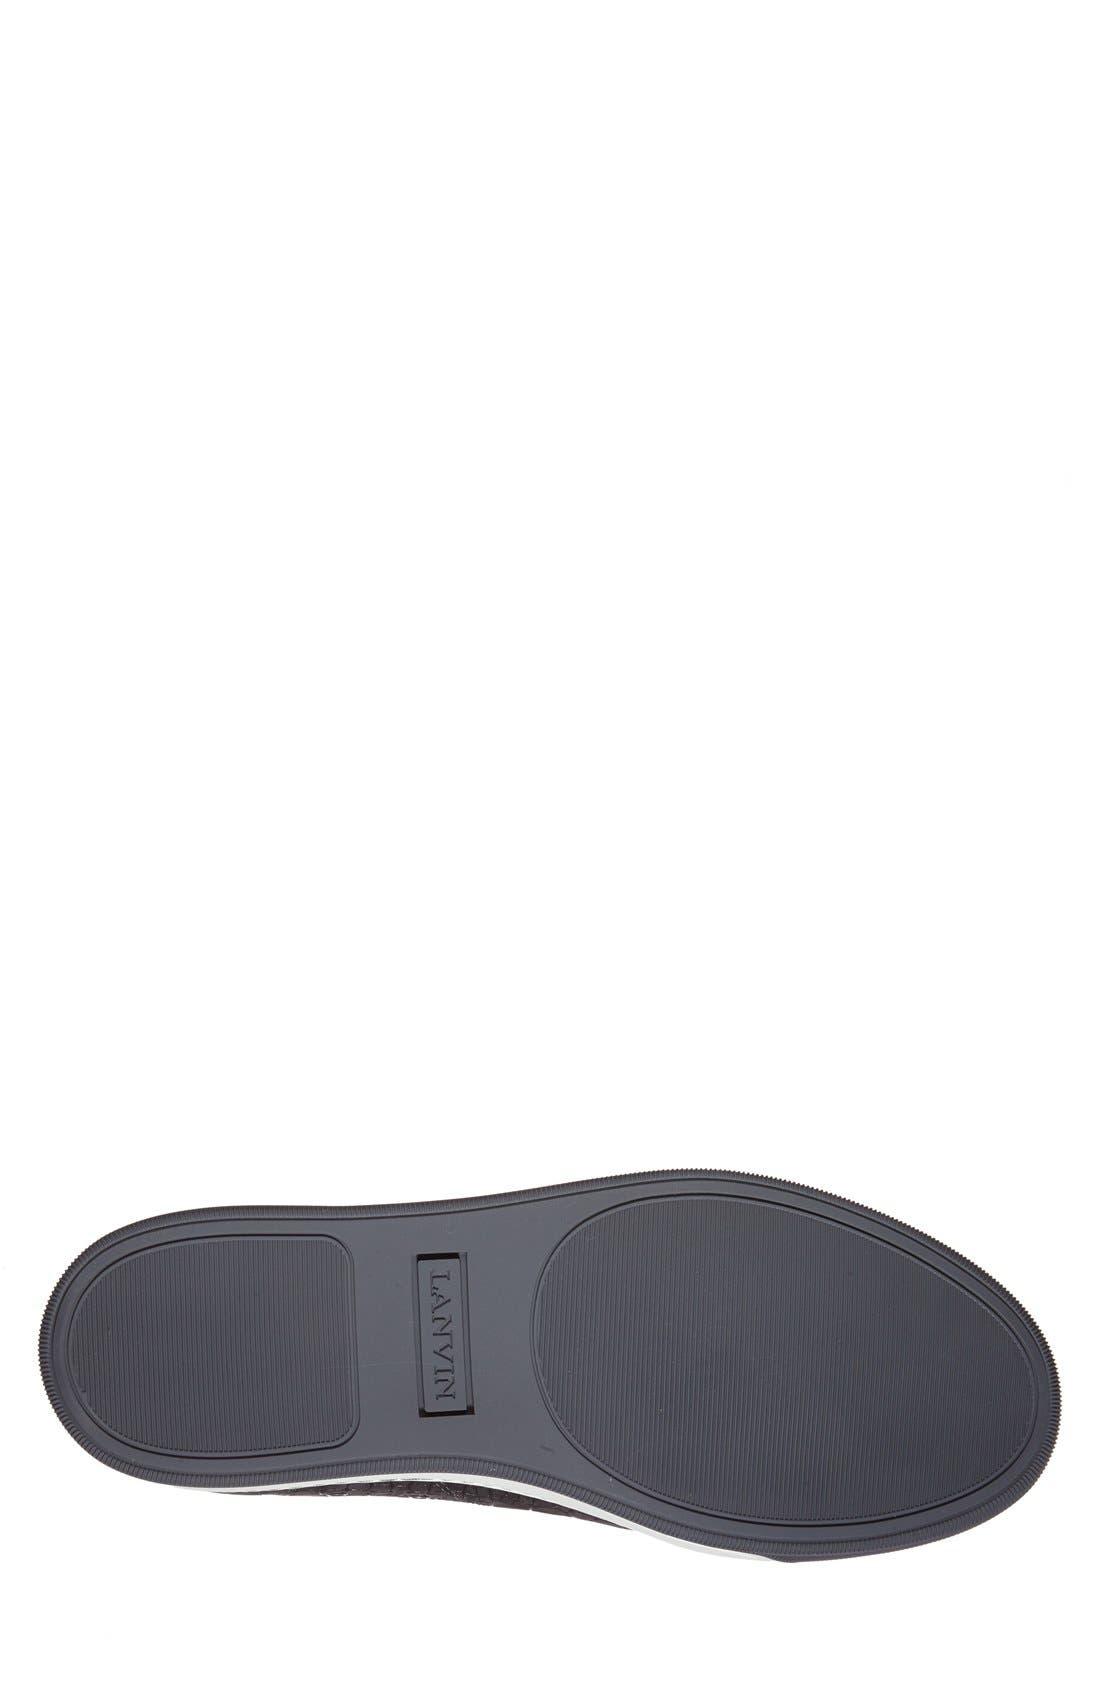 Embossed Nubuck Low Top Sneaker,                             Alternate thumbnail 4, color,                             024